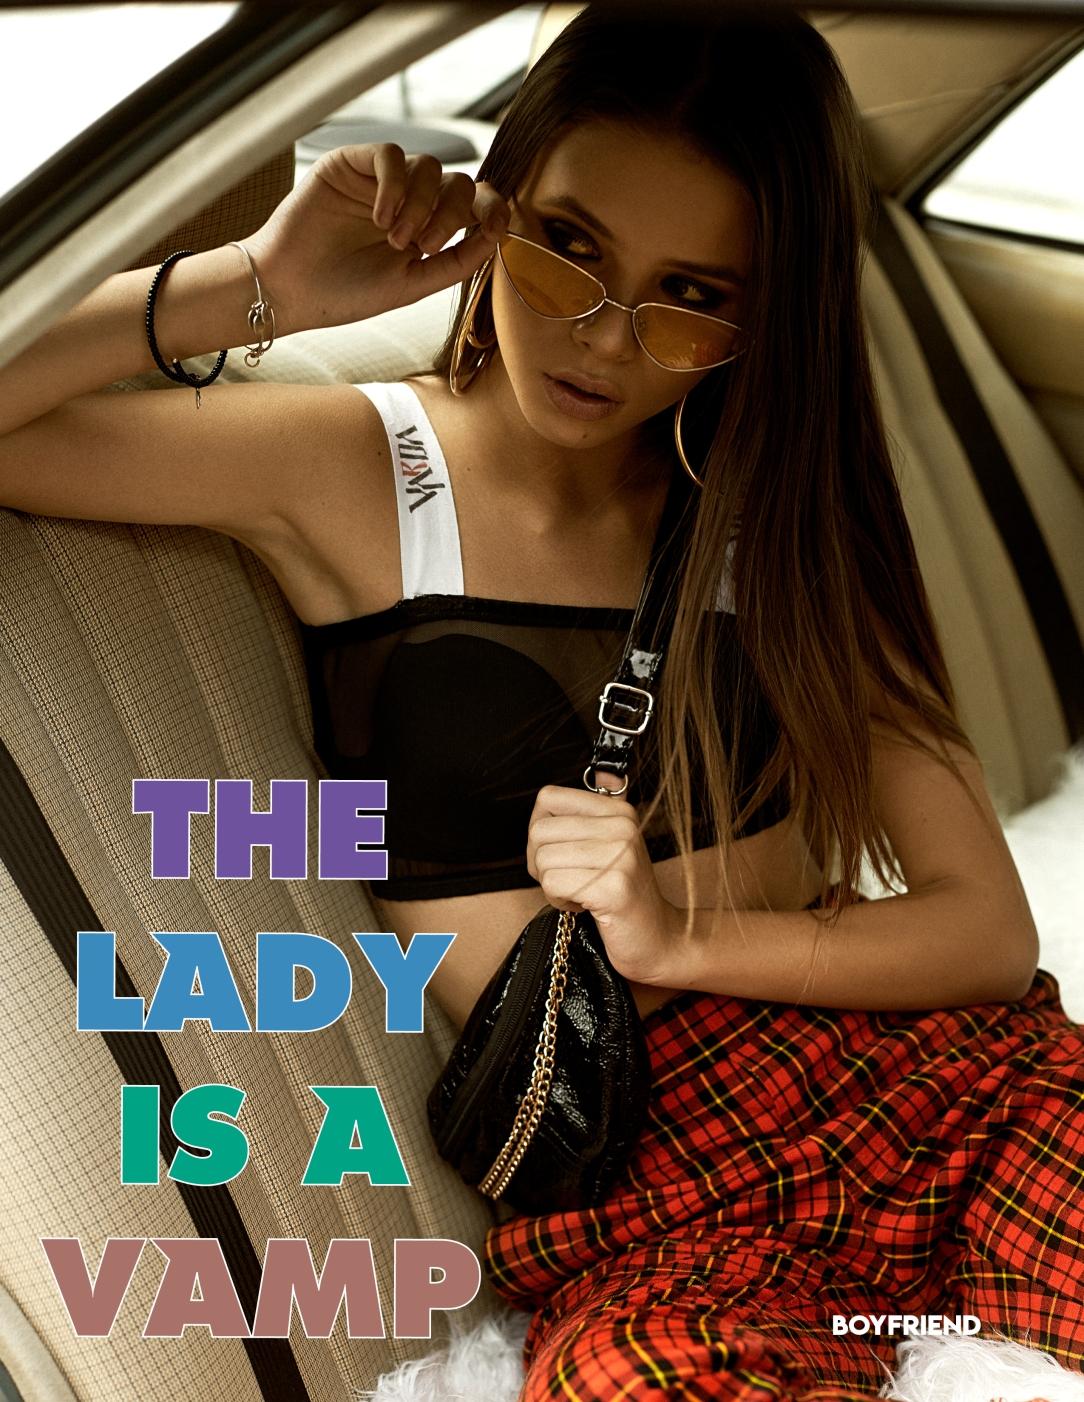 Boyfriend Mag - October 2018 - The Lady Is A Vamp - Sebastian Rojas